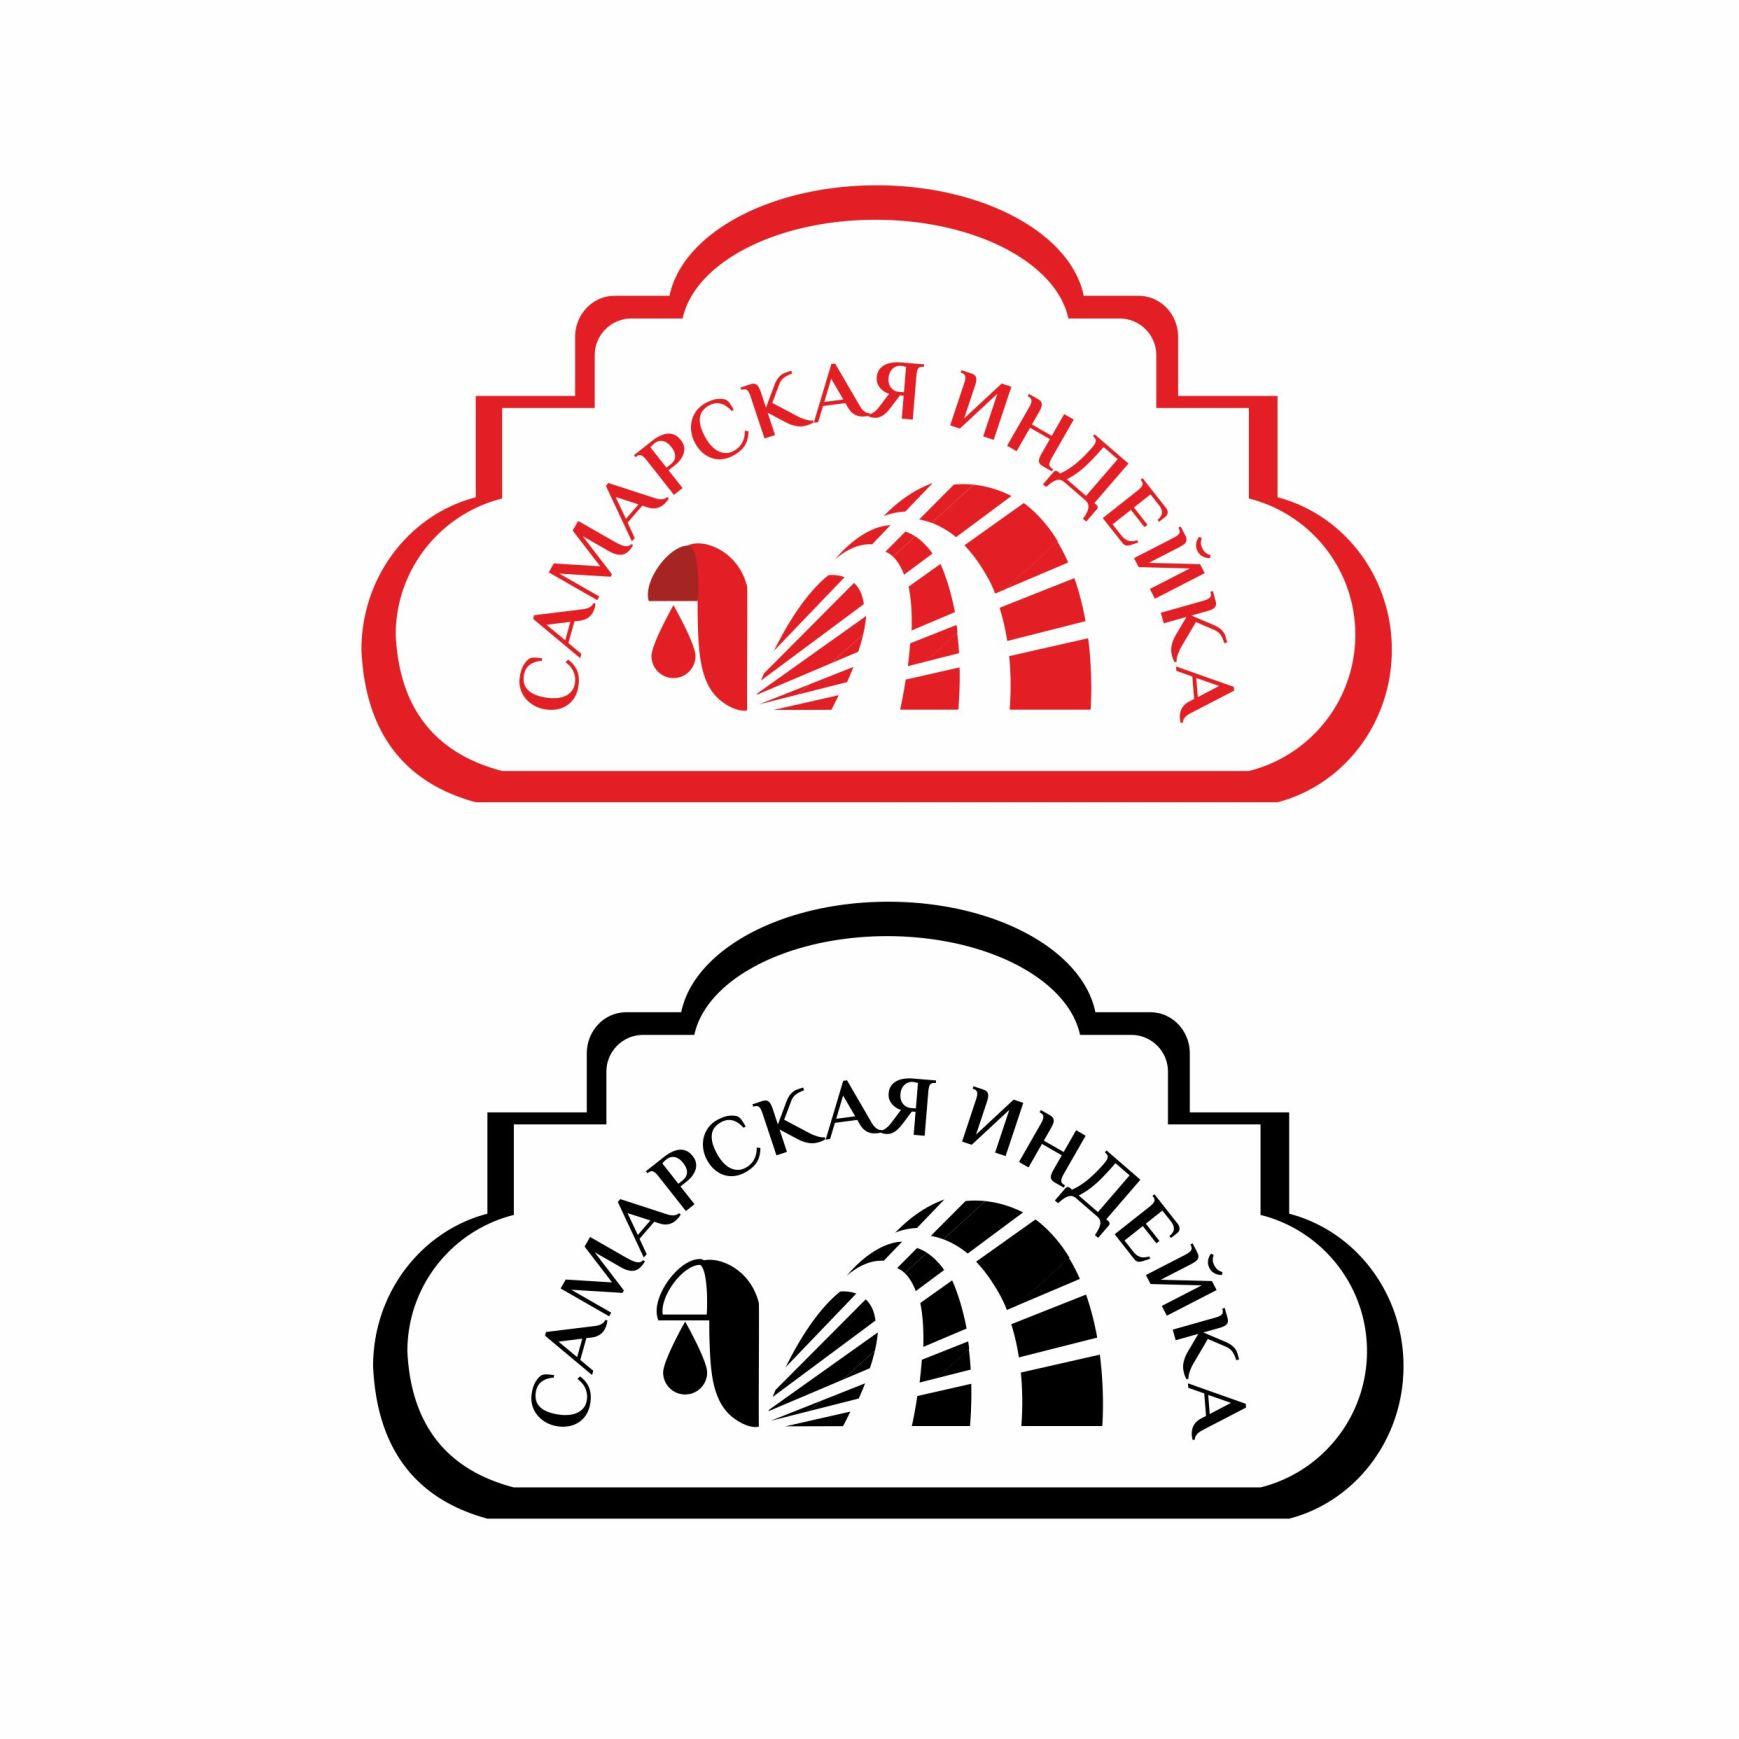 Создание логотипа Сельхоз производителя фото f_18055e8560b68d89.jpg